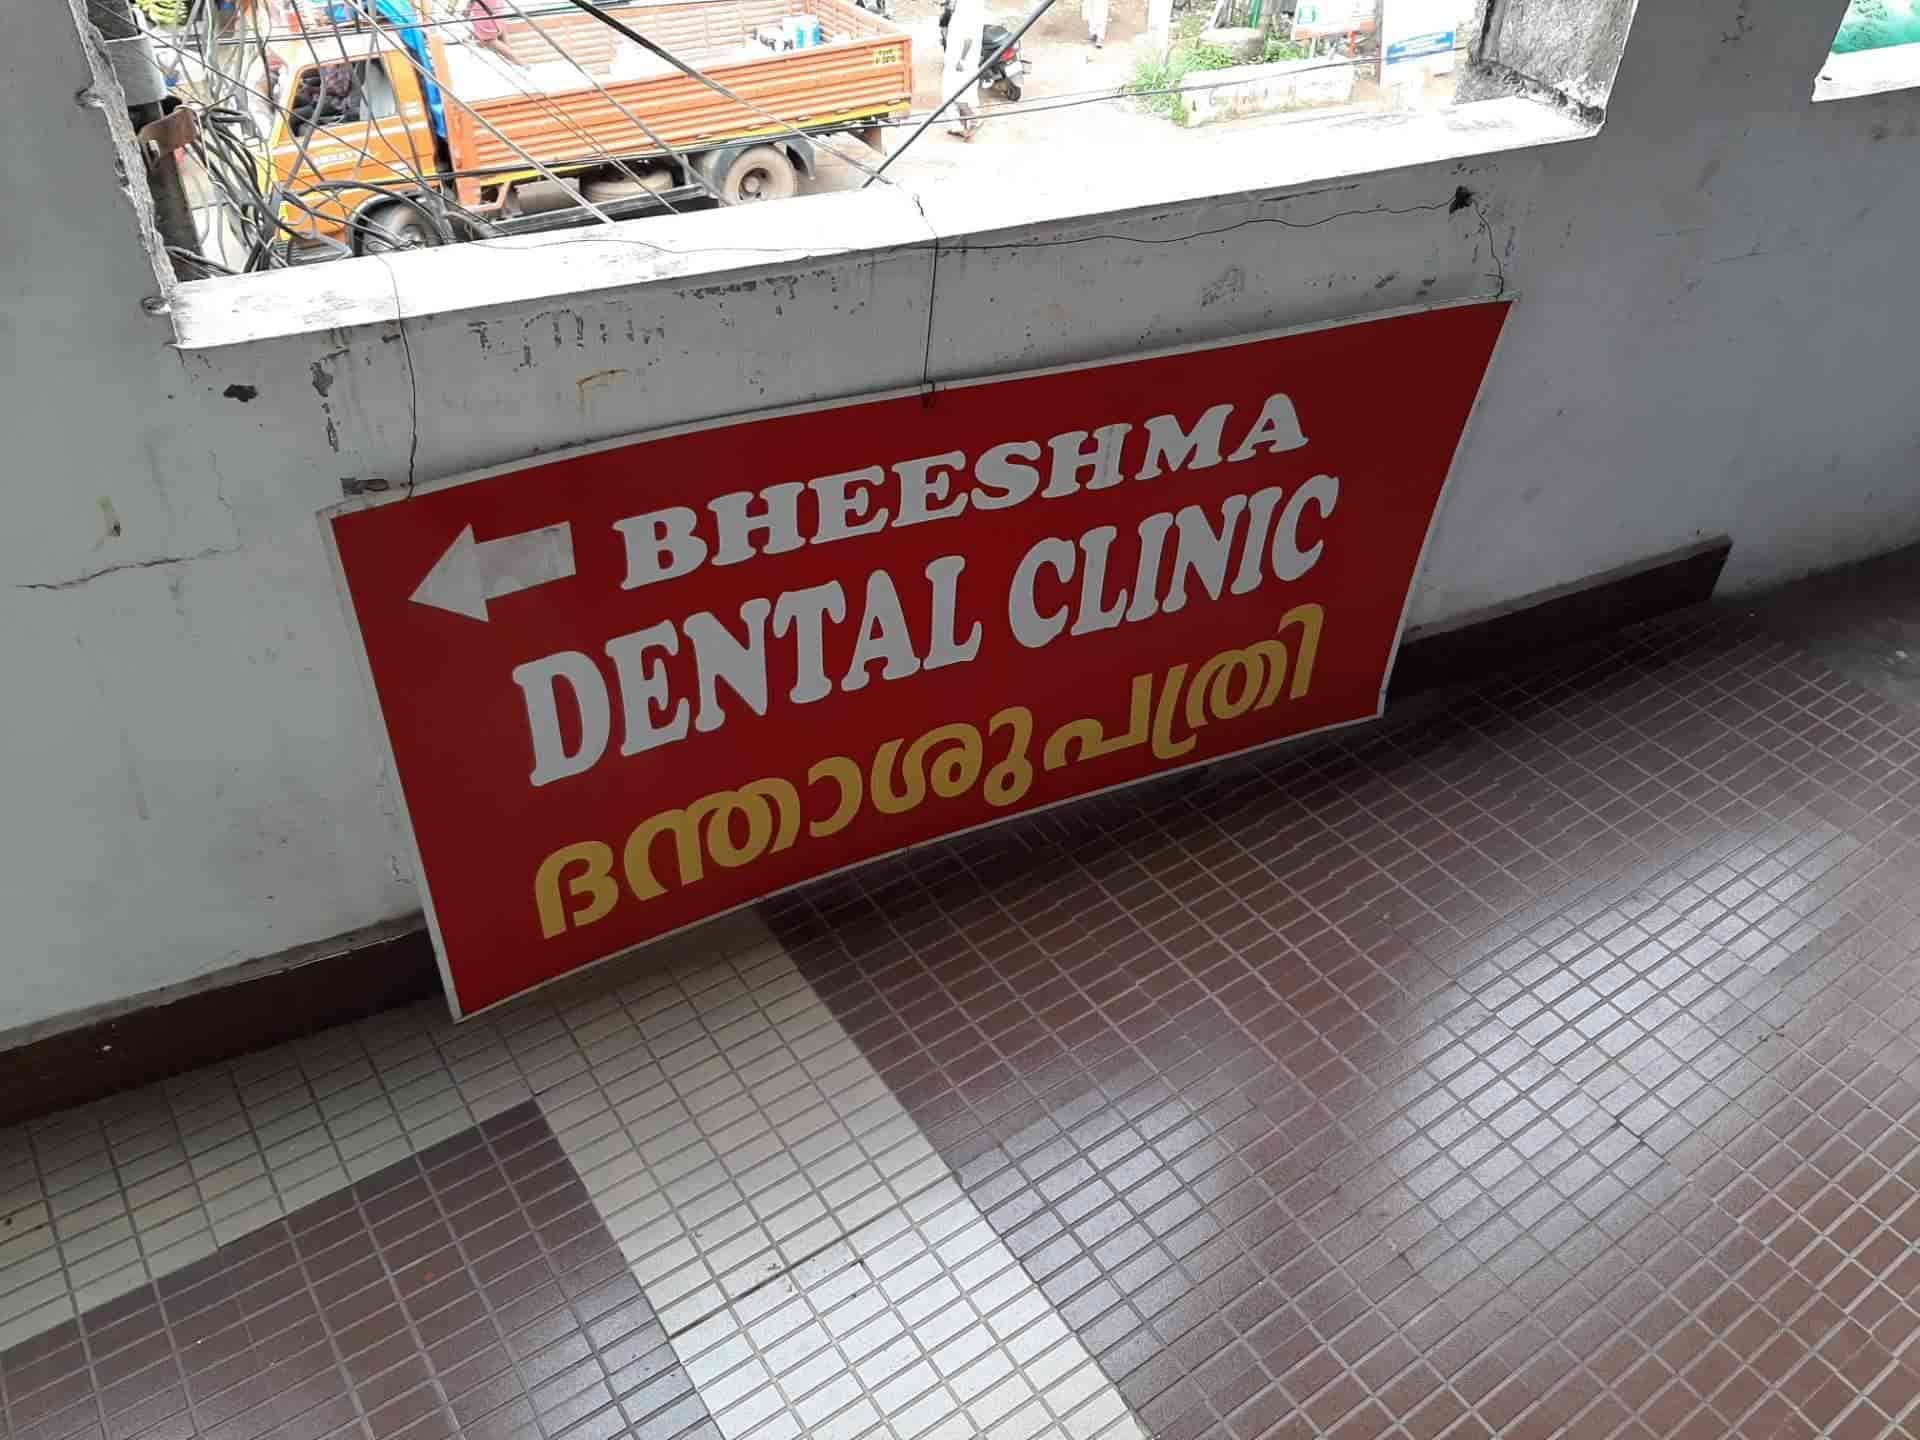 Bheeshma Dental Clinic Ashtamichira Clinics In Thrissur Justdial